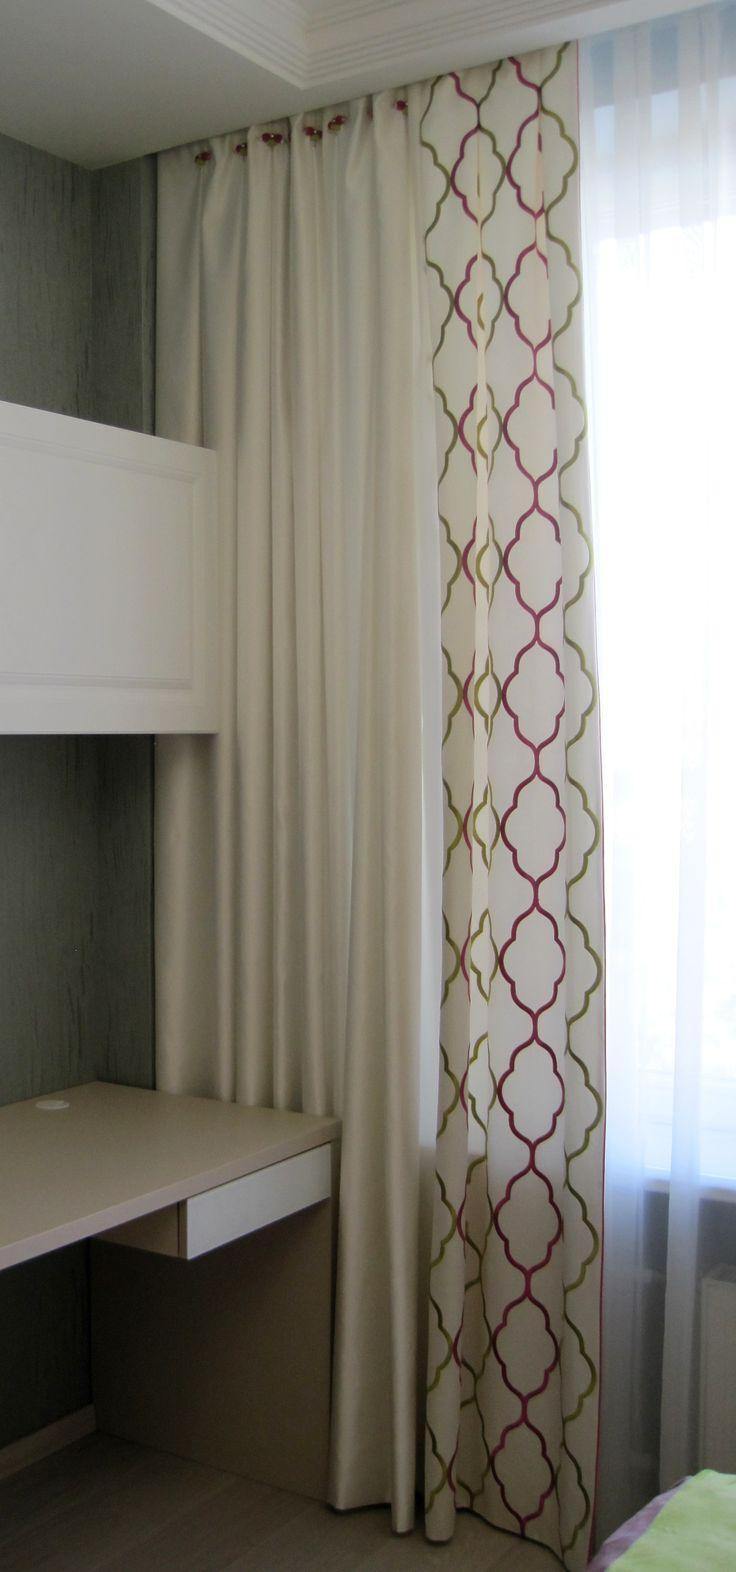 Home decoration autrefois rideaux - Window Coverings Window Treatments Window Dressings Curtain Ideas Color Interior Shutters Blinds Curtains Net Curtains